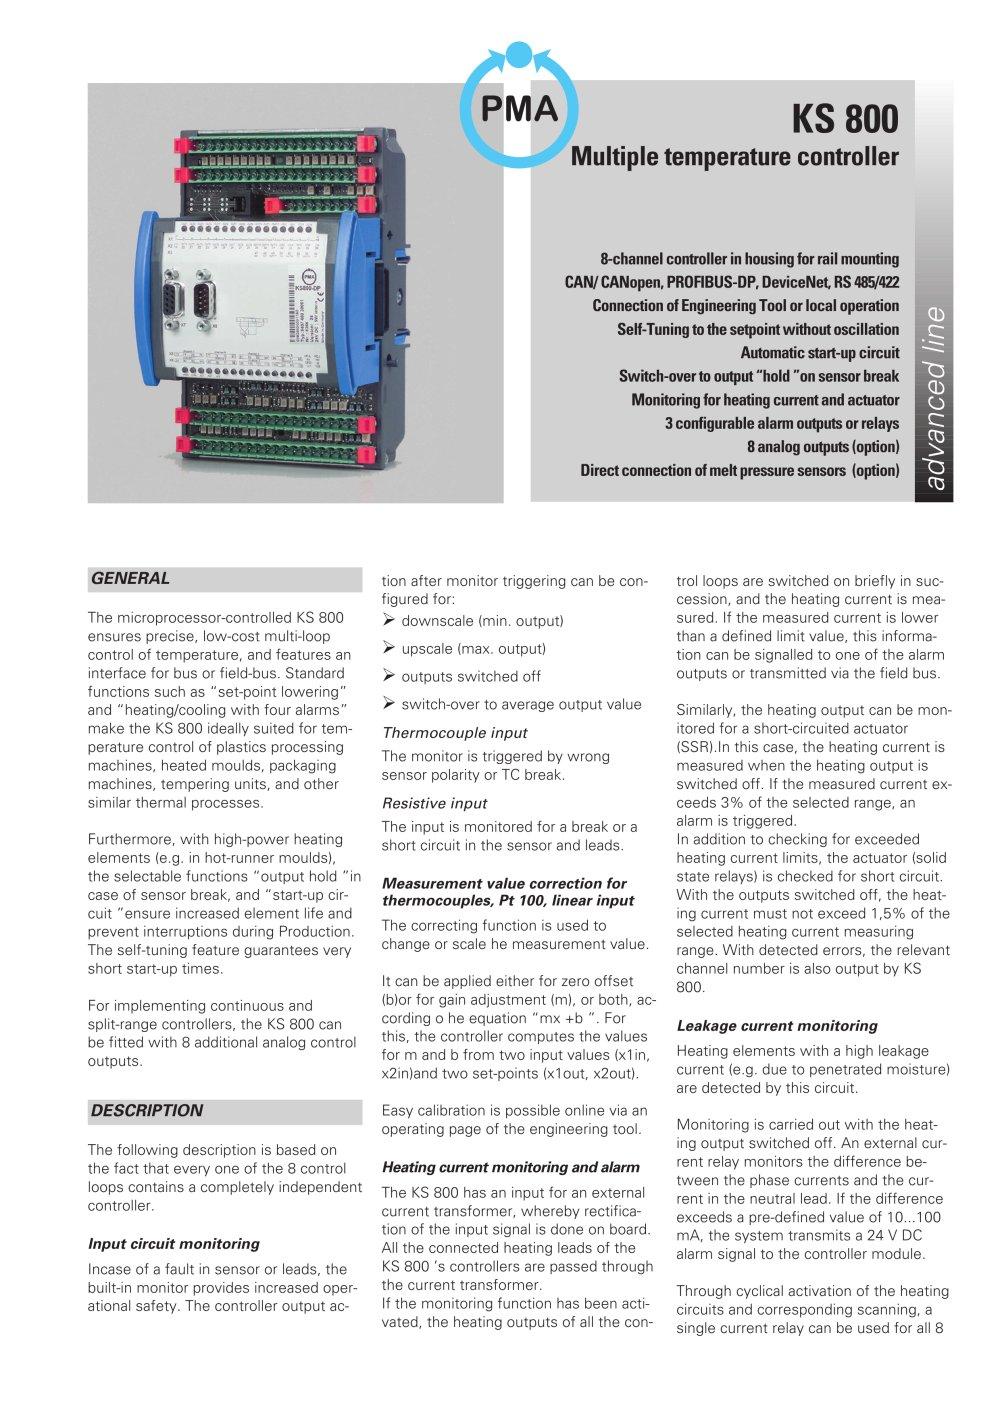 Ks 800 Multiple Temperature Controller West Control Solutions Heat Sensor Automatic 1 6 Pages